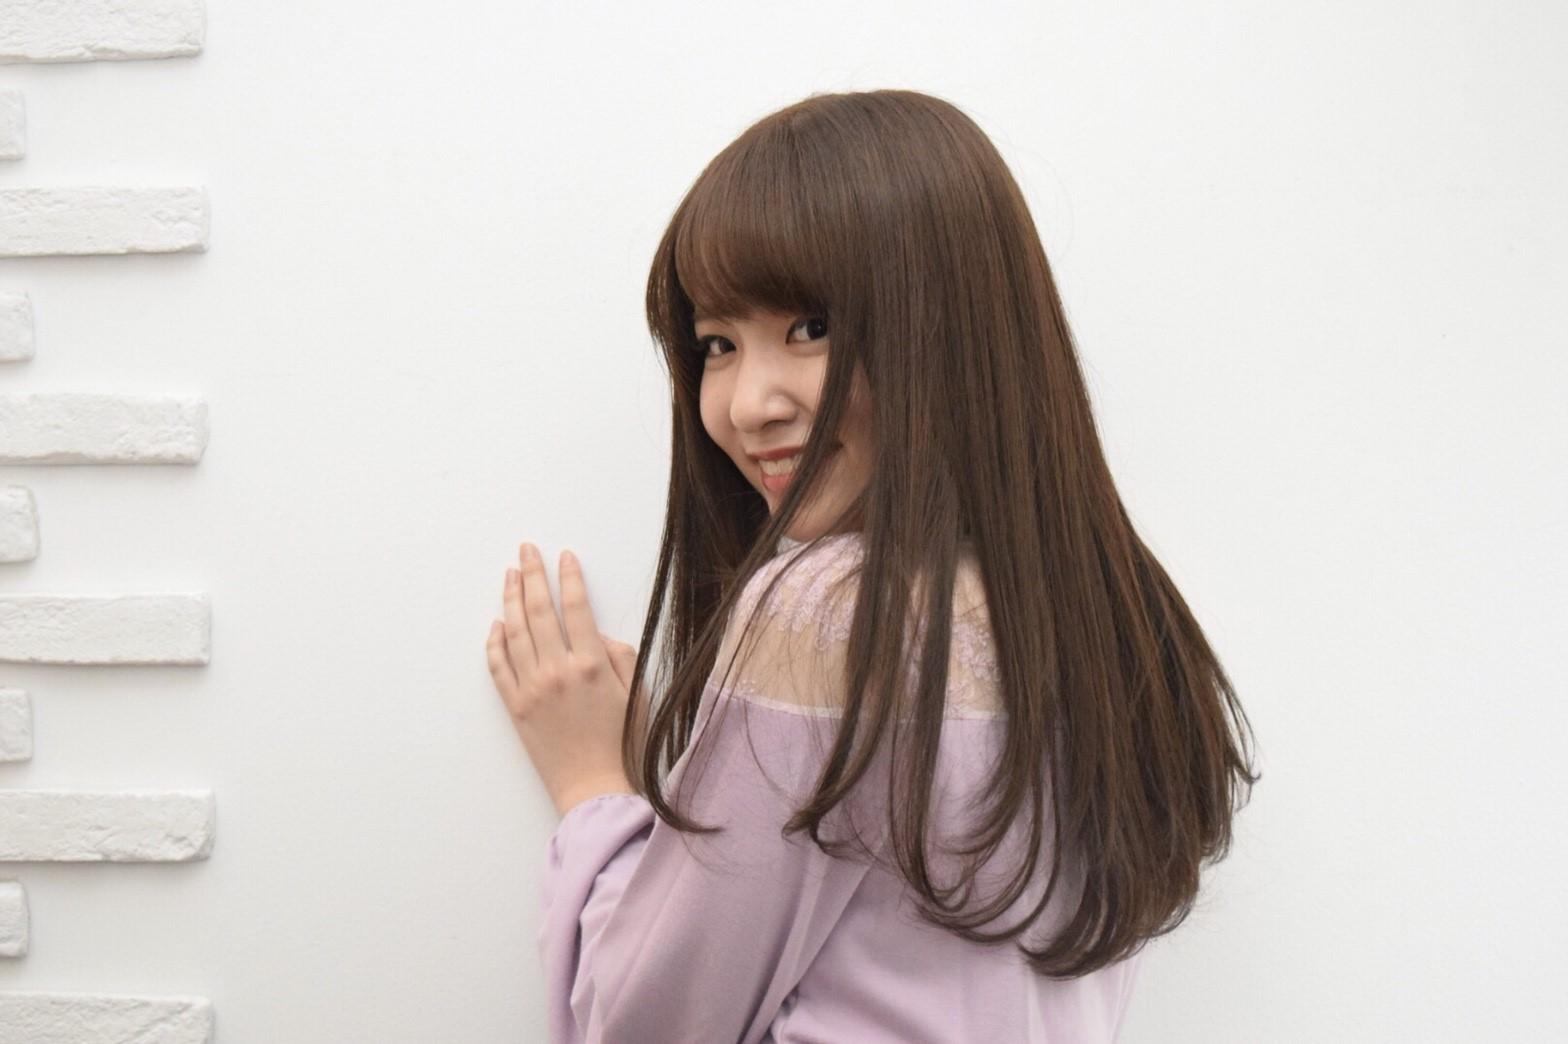 http://ad1030pcqc.smartrelease.jp/news/1513576445431.jpg